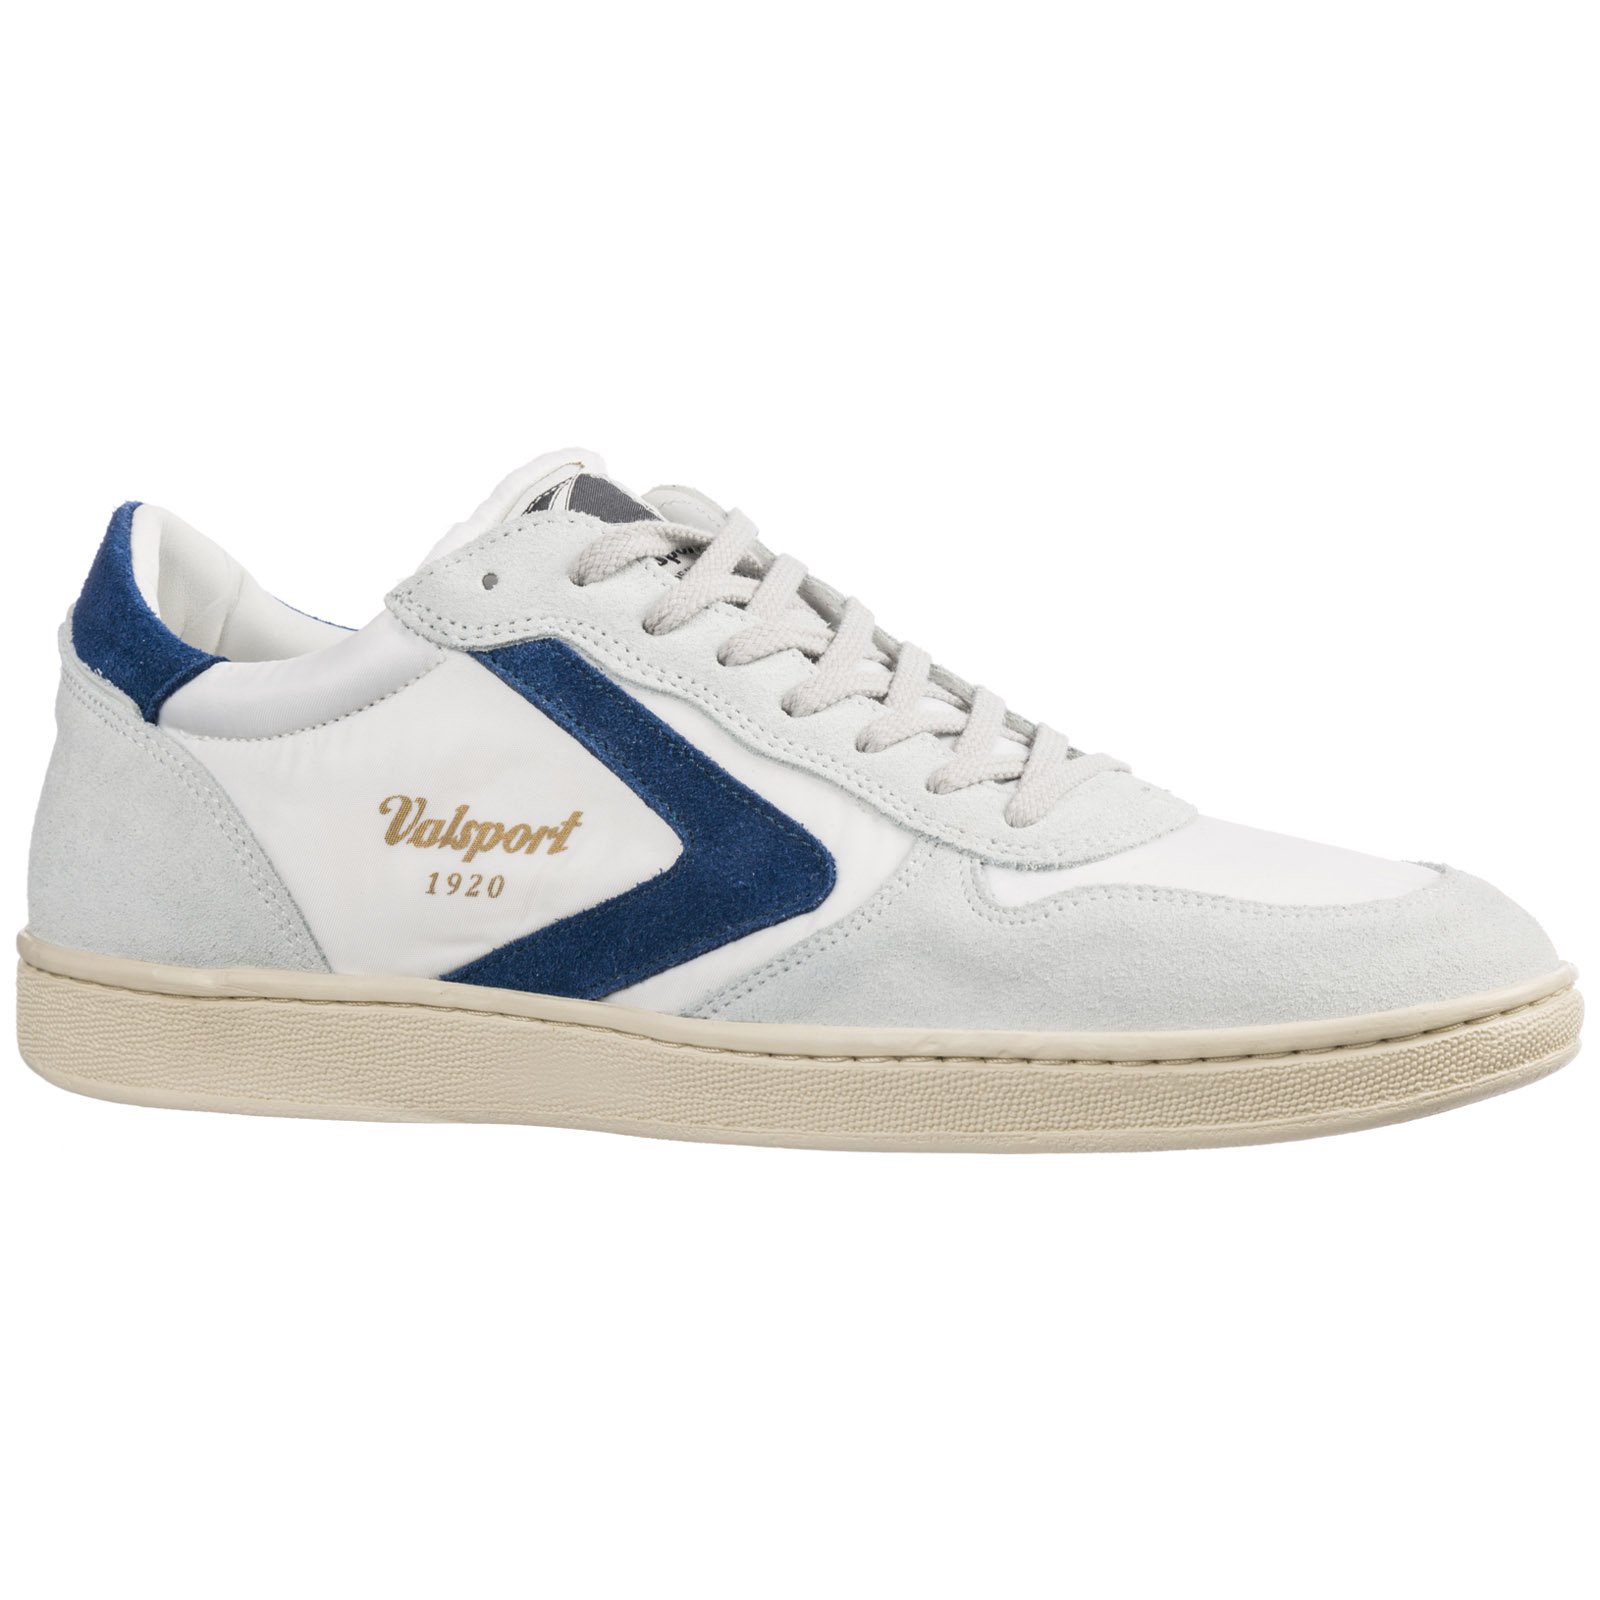 Herren Schuhe Davis Herrenschuhe Sneakers Wildleder 6mbY7fgyIv